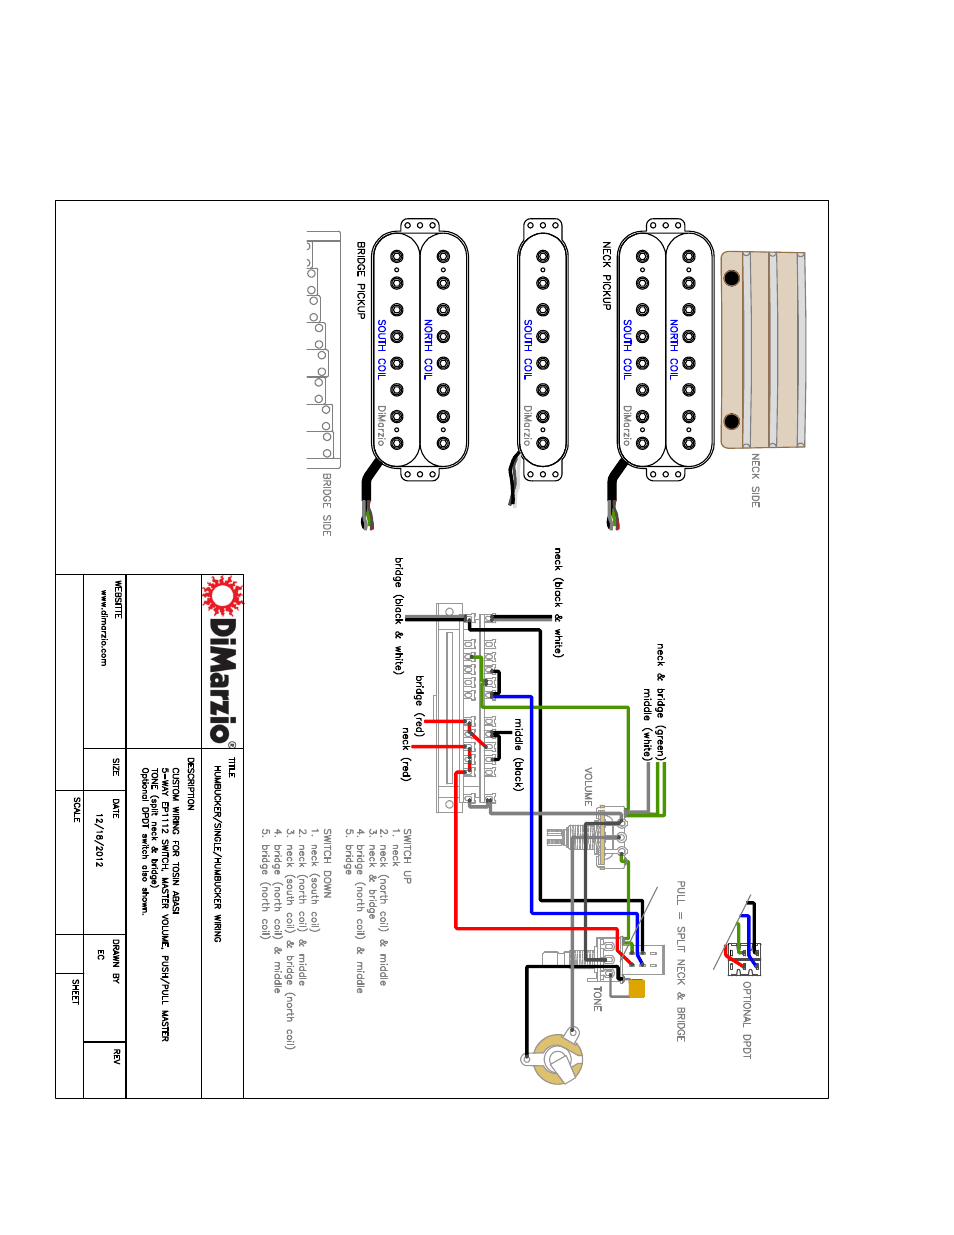 Dimarzio 5 Way Switch Wiring Diagram : 36 Wiring Diagram